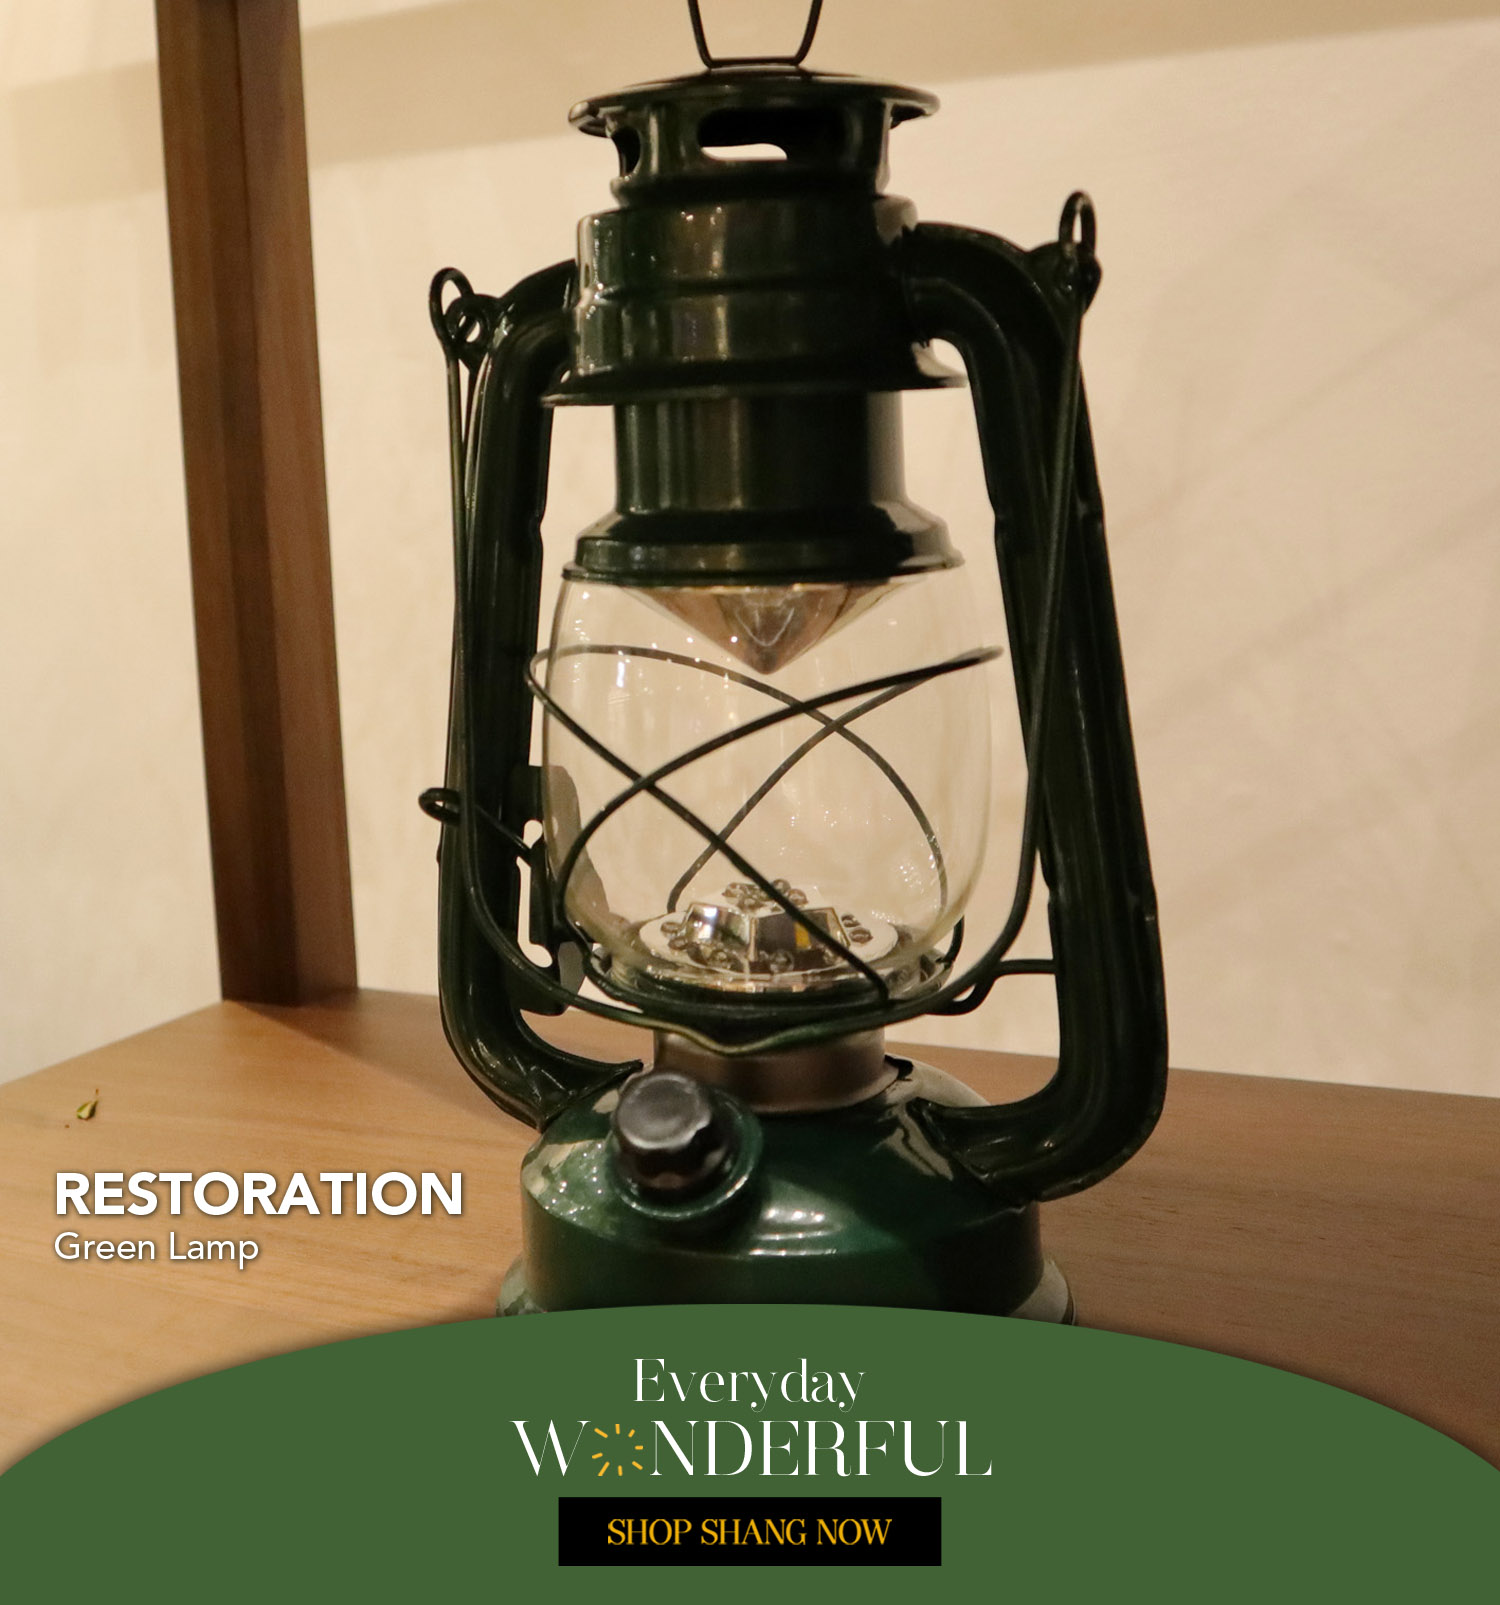 Green Lantern Lamp from Restoration